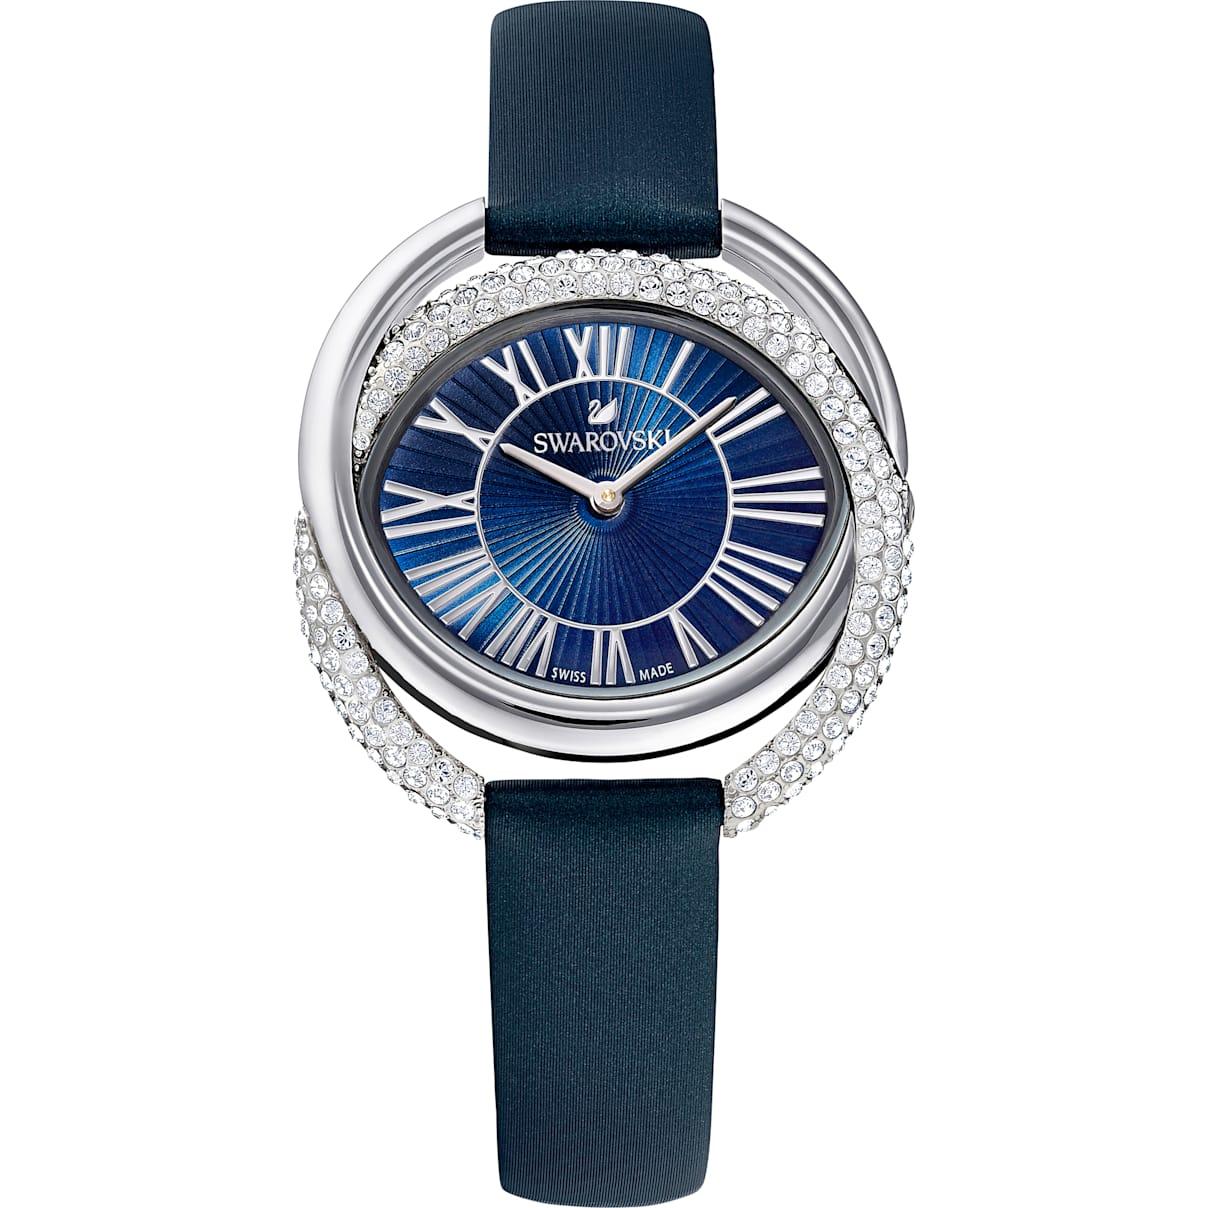 Swarovski Duo Watch, Leather Strap, Blue, Stainless Steel